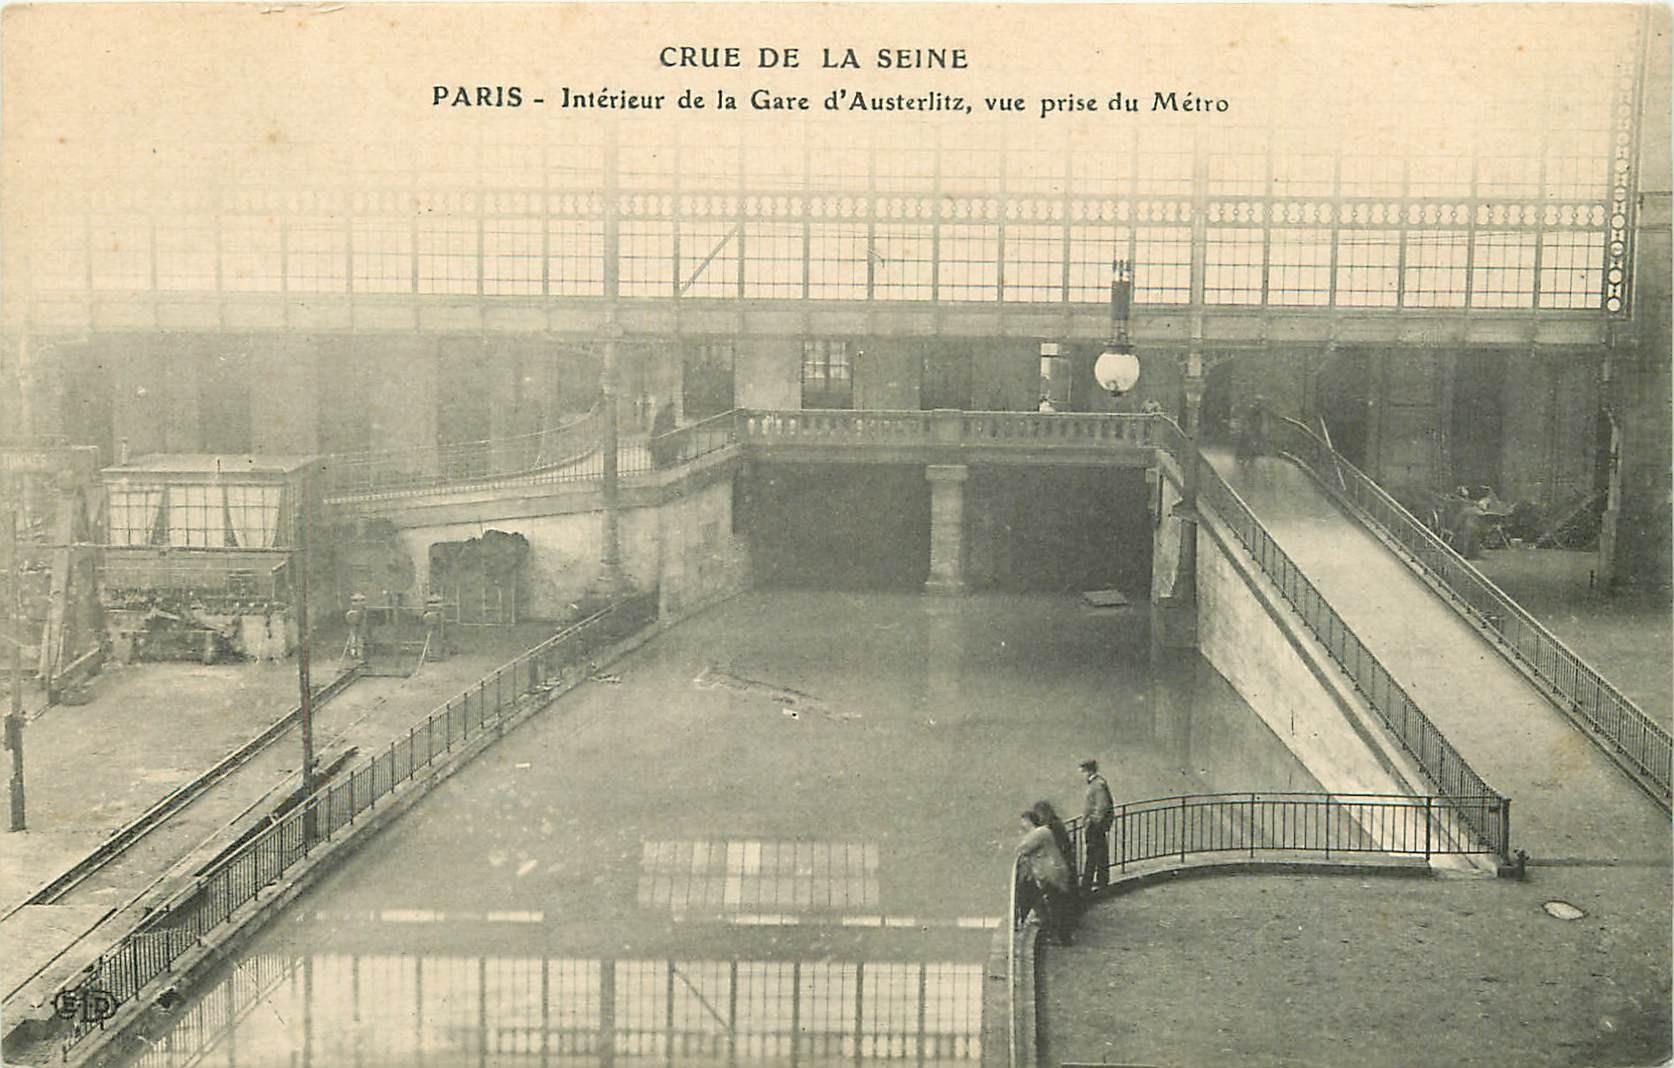 75005 PARIS. Métro de la Gare d'Austerlitz inondé pendant la Crue de 1910